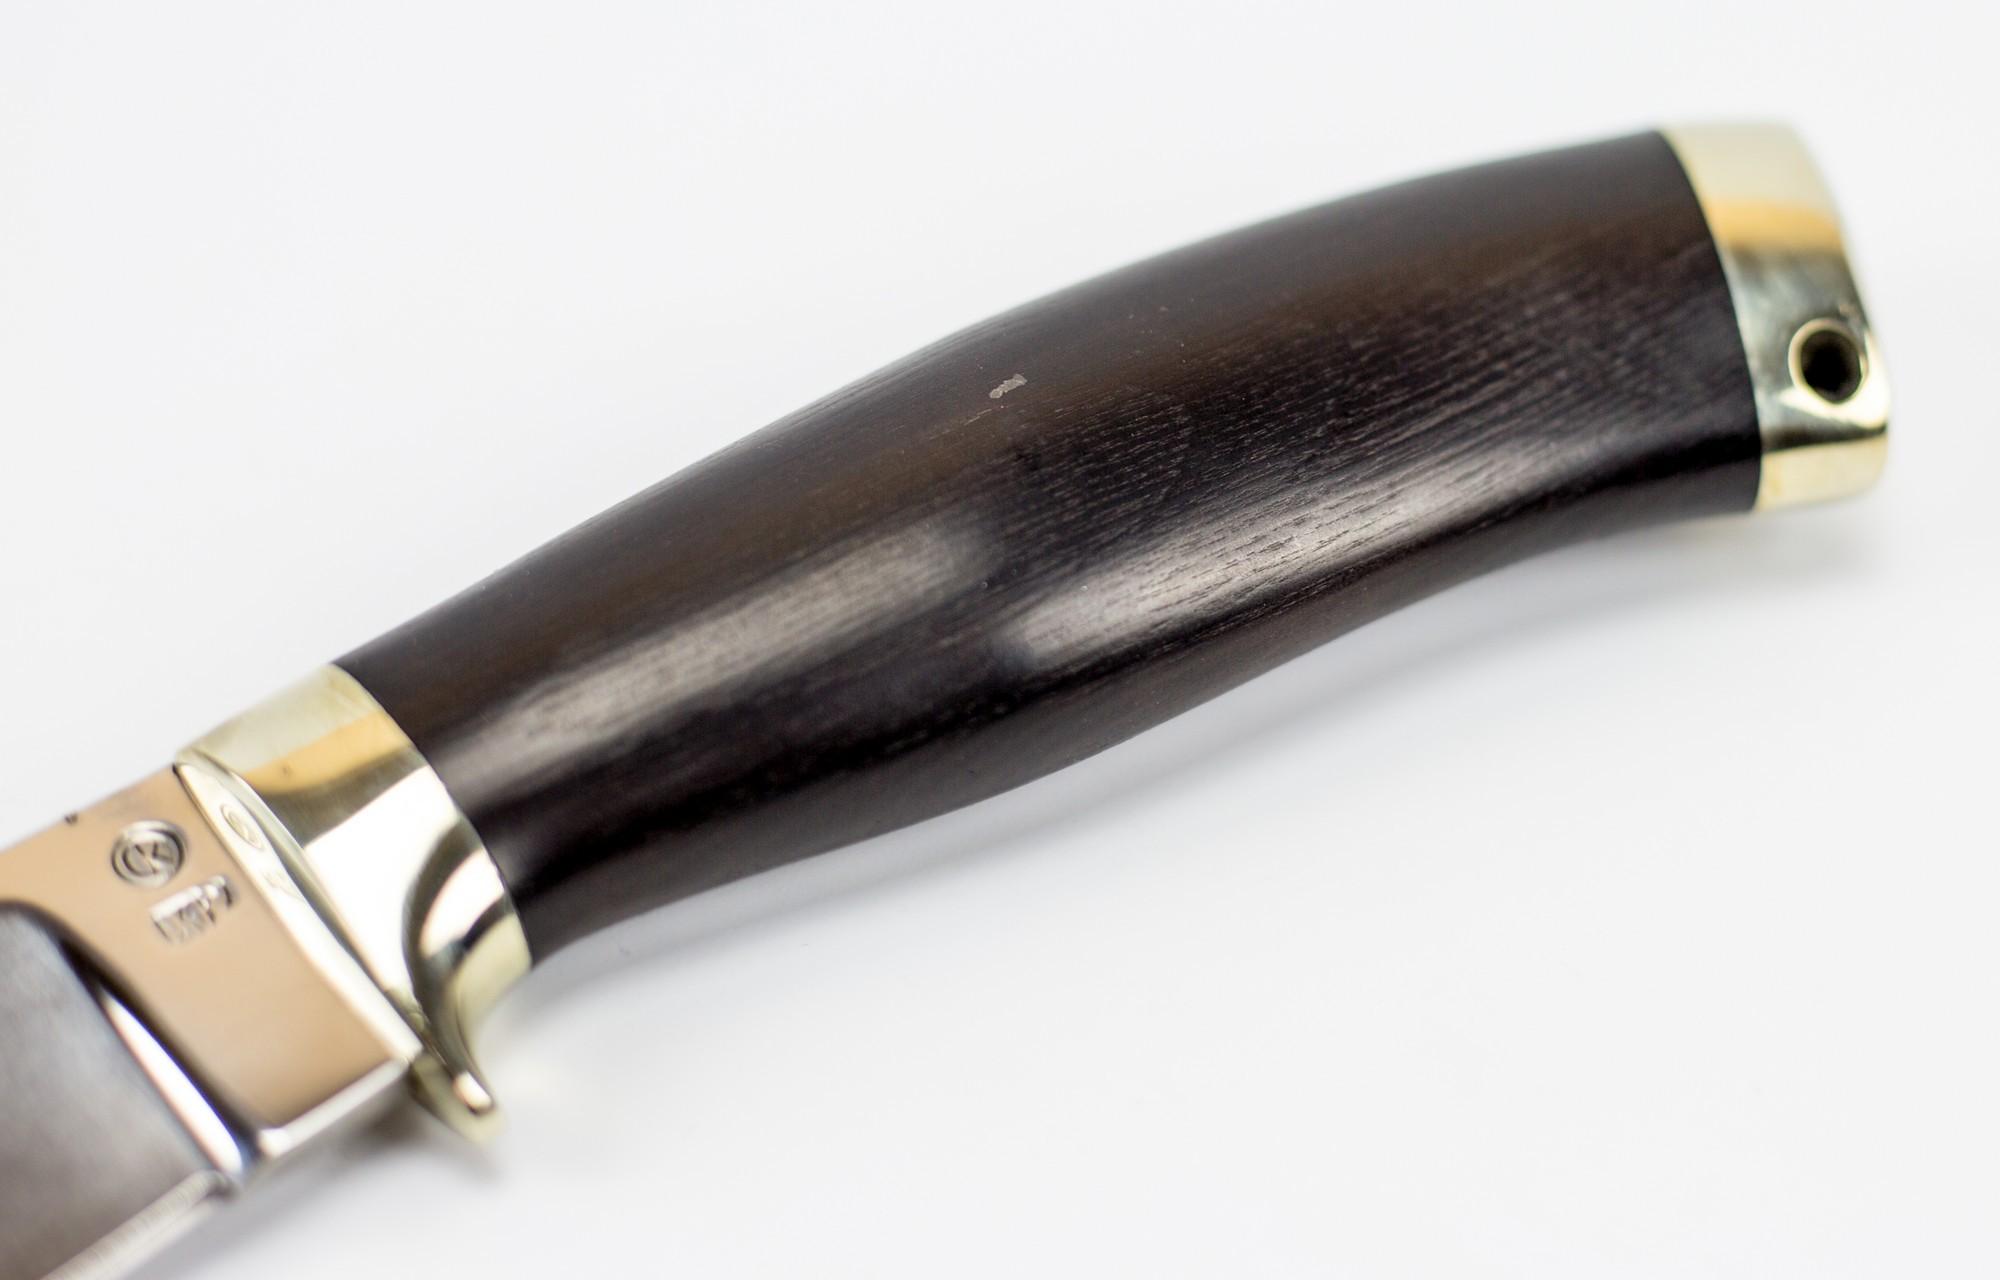 Фото 2 - Нож Лесник, сталь Х12МФ от Ножи Крутова